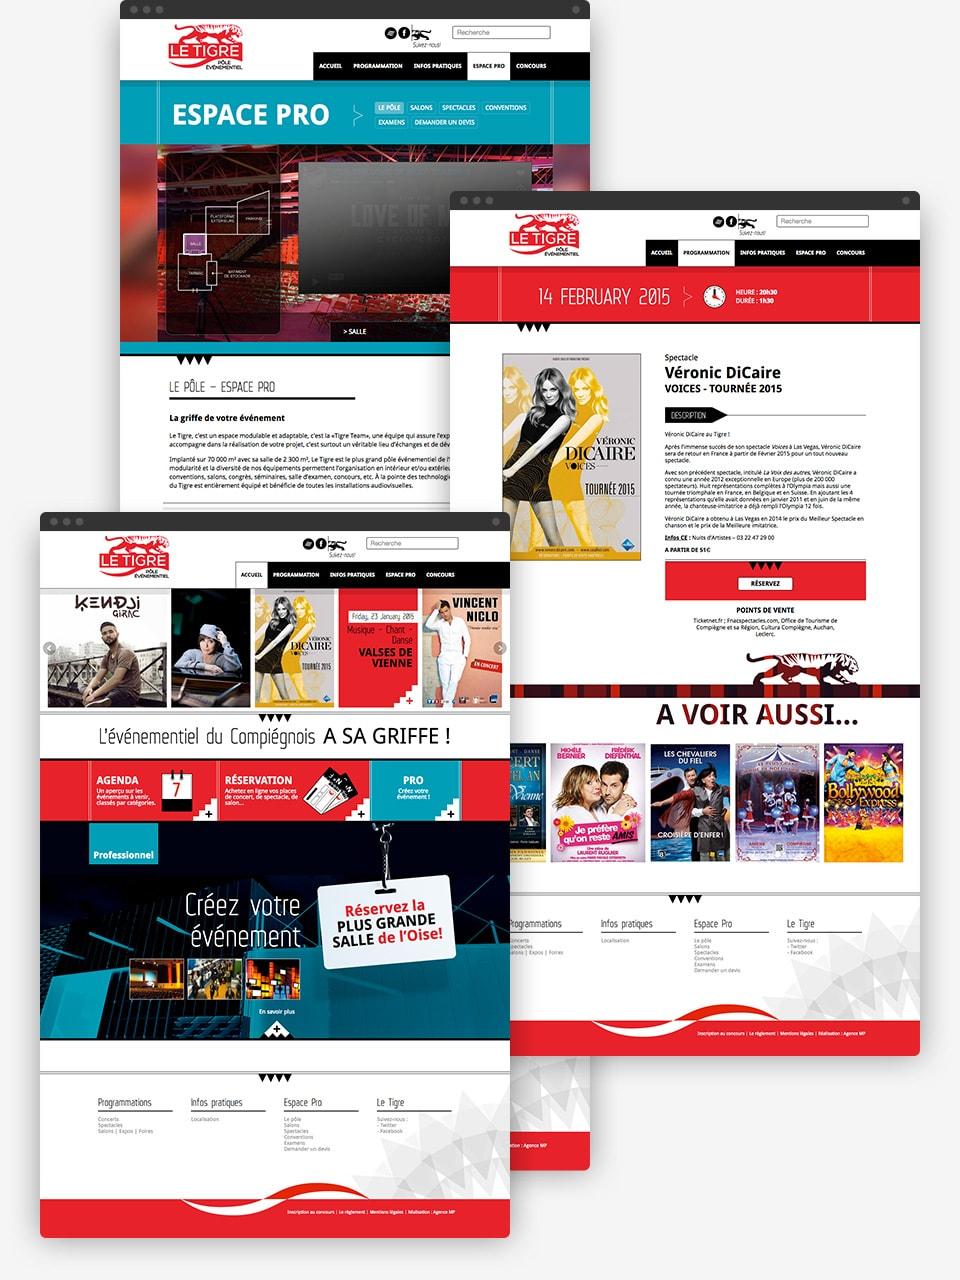 Le Tigre website preview